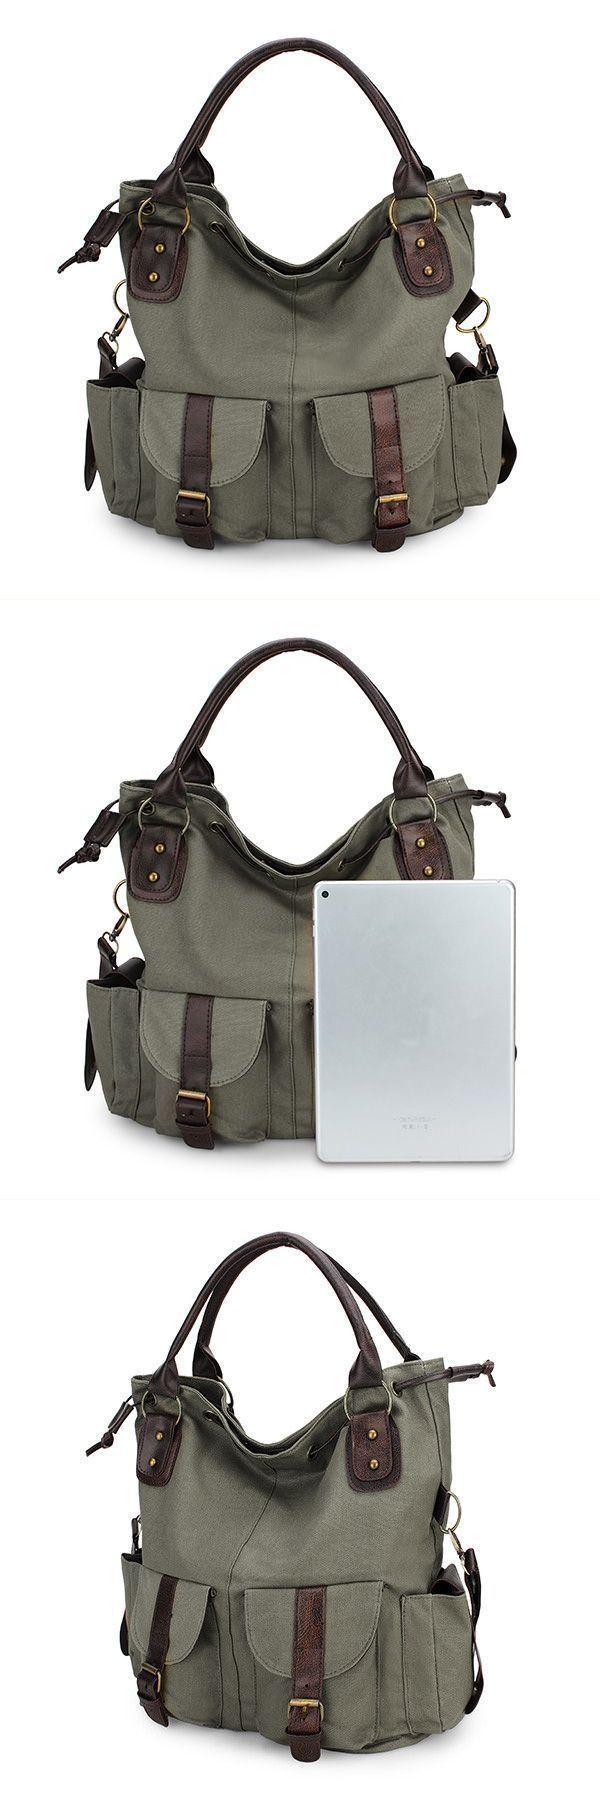 women casual canvas drawstring handbags multi pocket shoulder bags crossbody bags handbags express #88 #handbags #handbags #jcpenney #handbags #tj #maxx #oxygen #02 #handbags